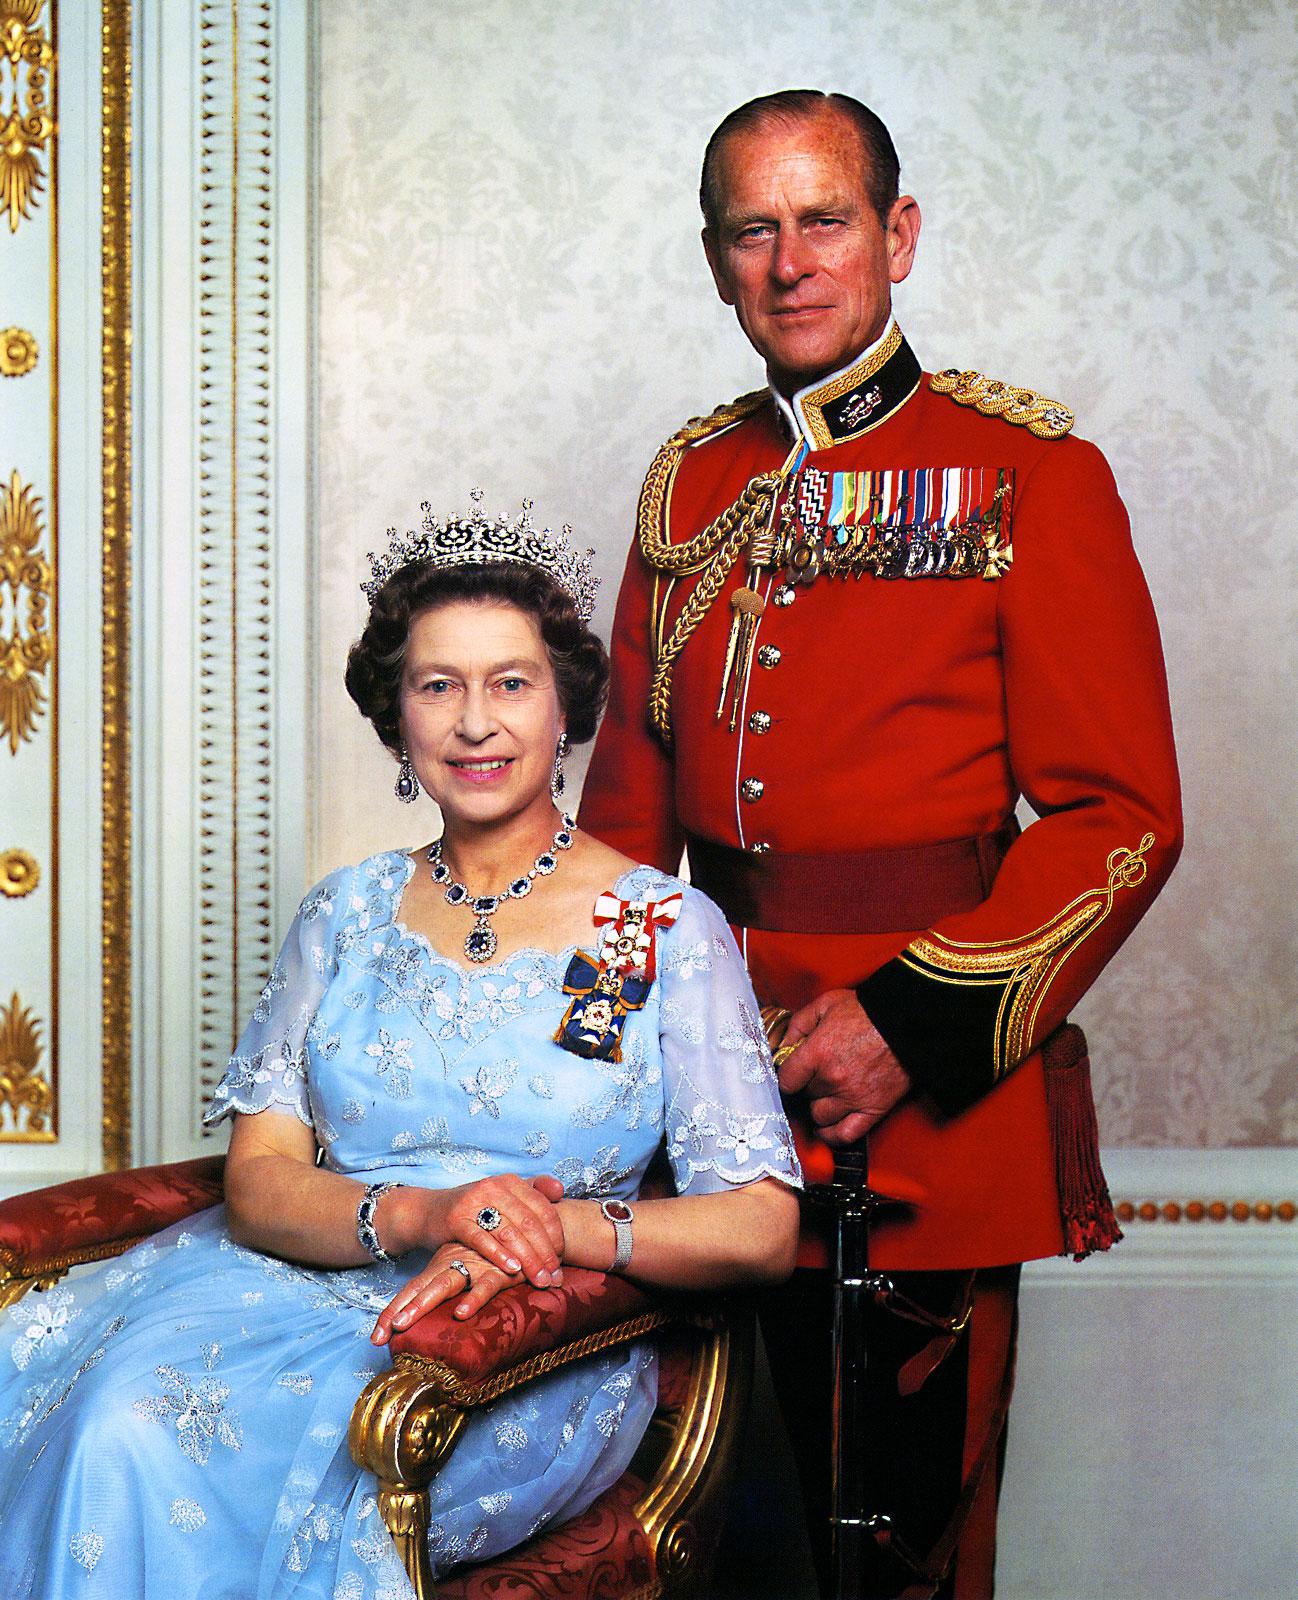 http://1.bp.blogspot.com/-8dWt3sh6_X8/TgrPSrWGK4I/AAAAAAAAKoA/Nskm8dwfODo/s1600/Queen-Elizabeth-and-Prince-Philip-Patek-Philippe.jpg